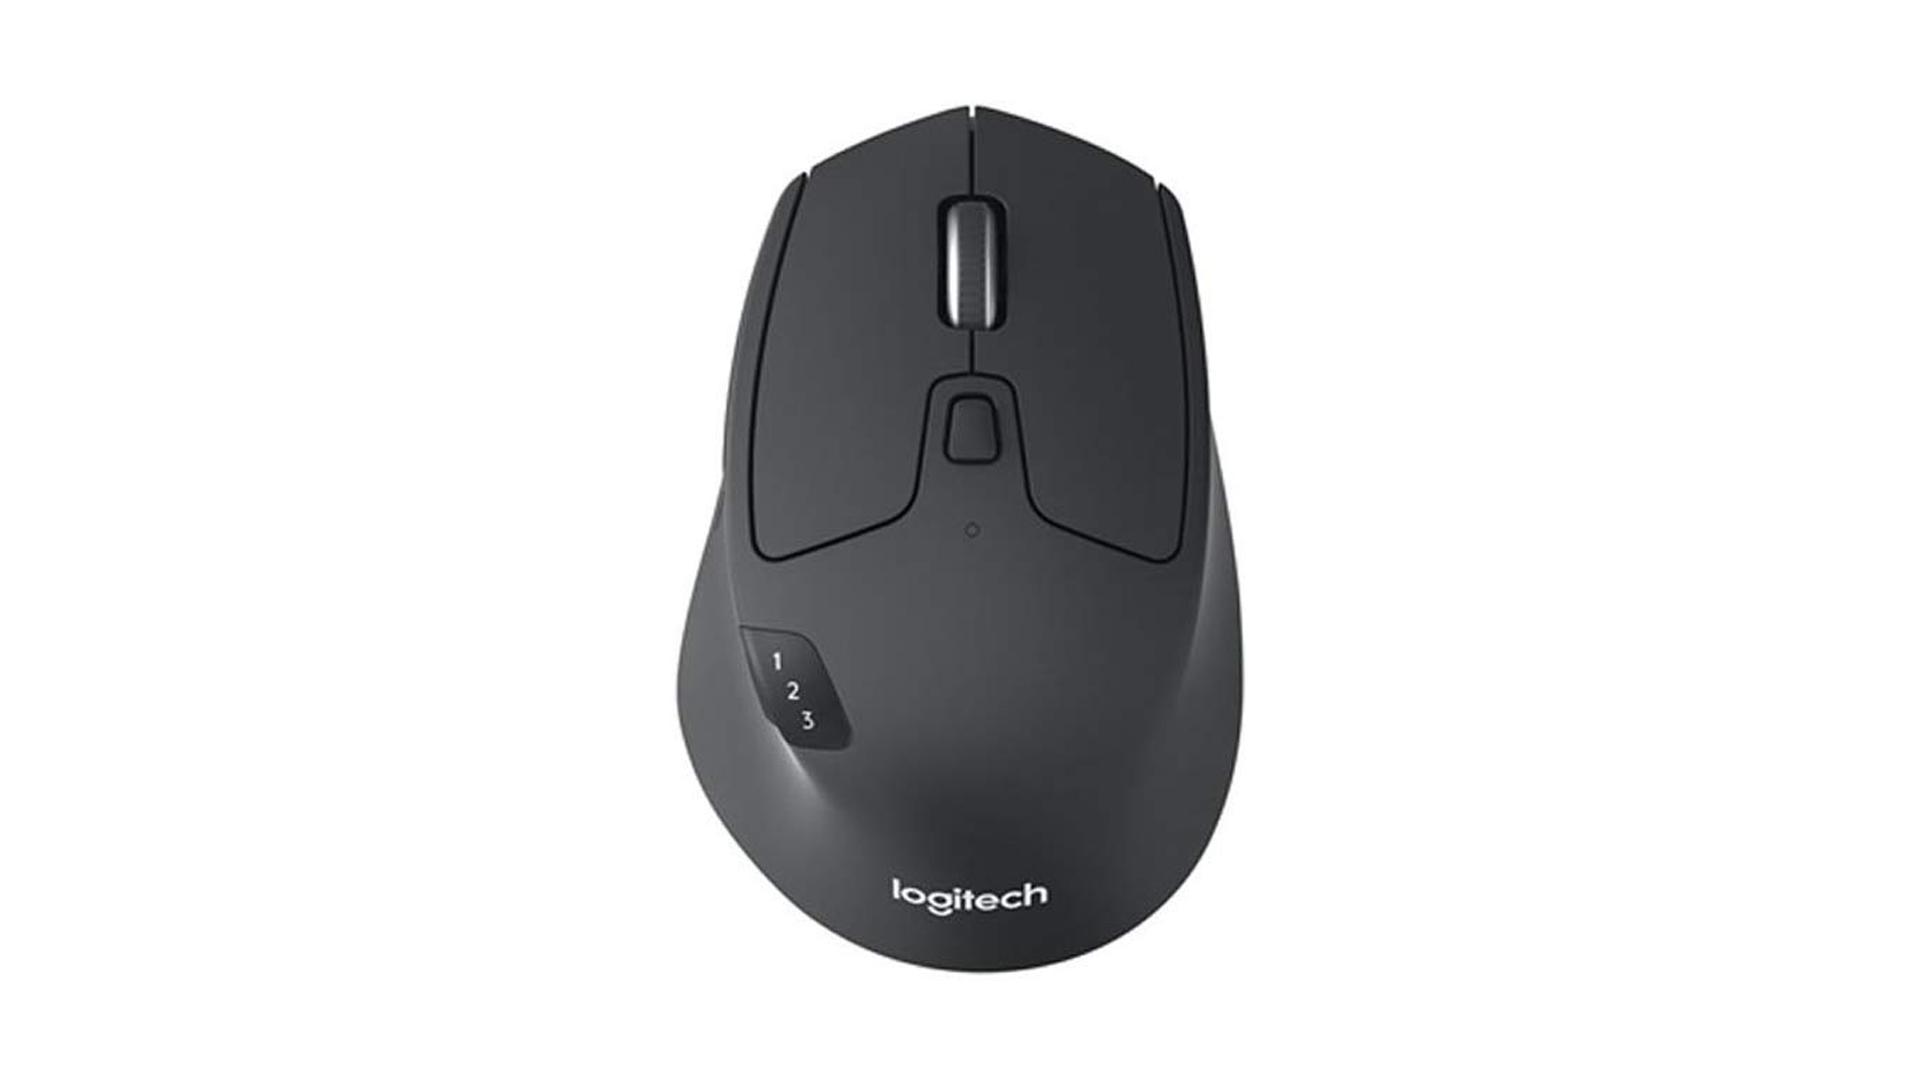 A photo of the Logitech triathlon mouse.